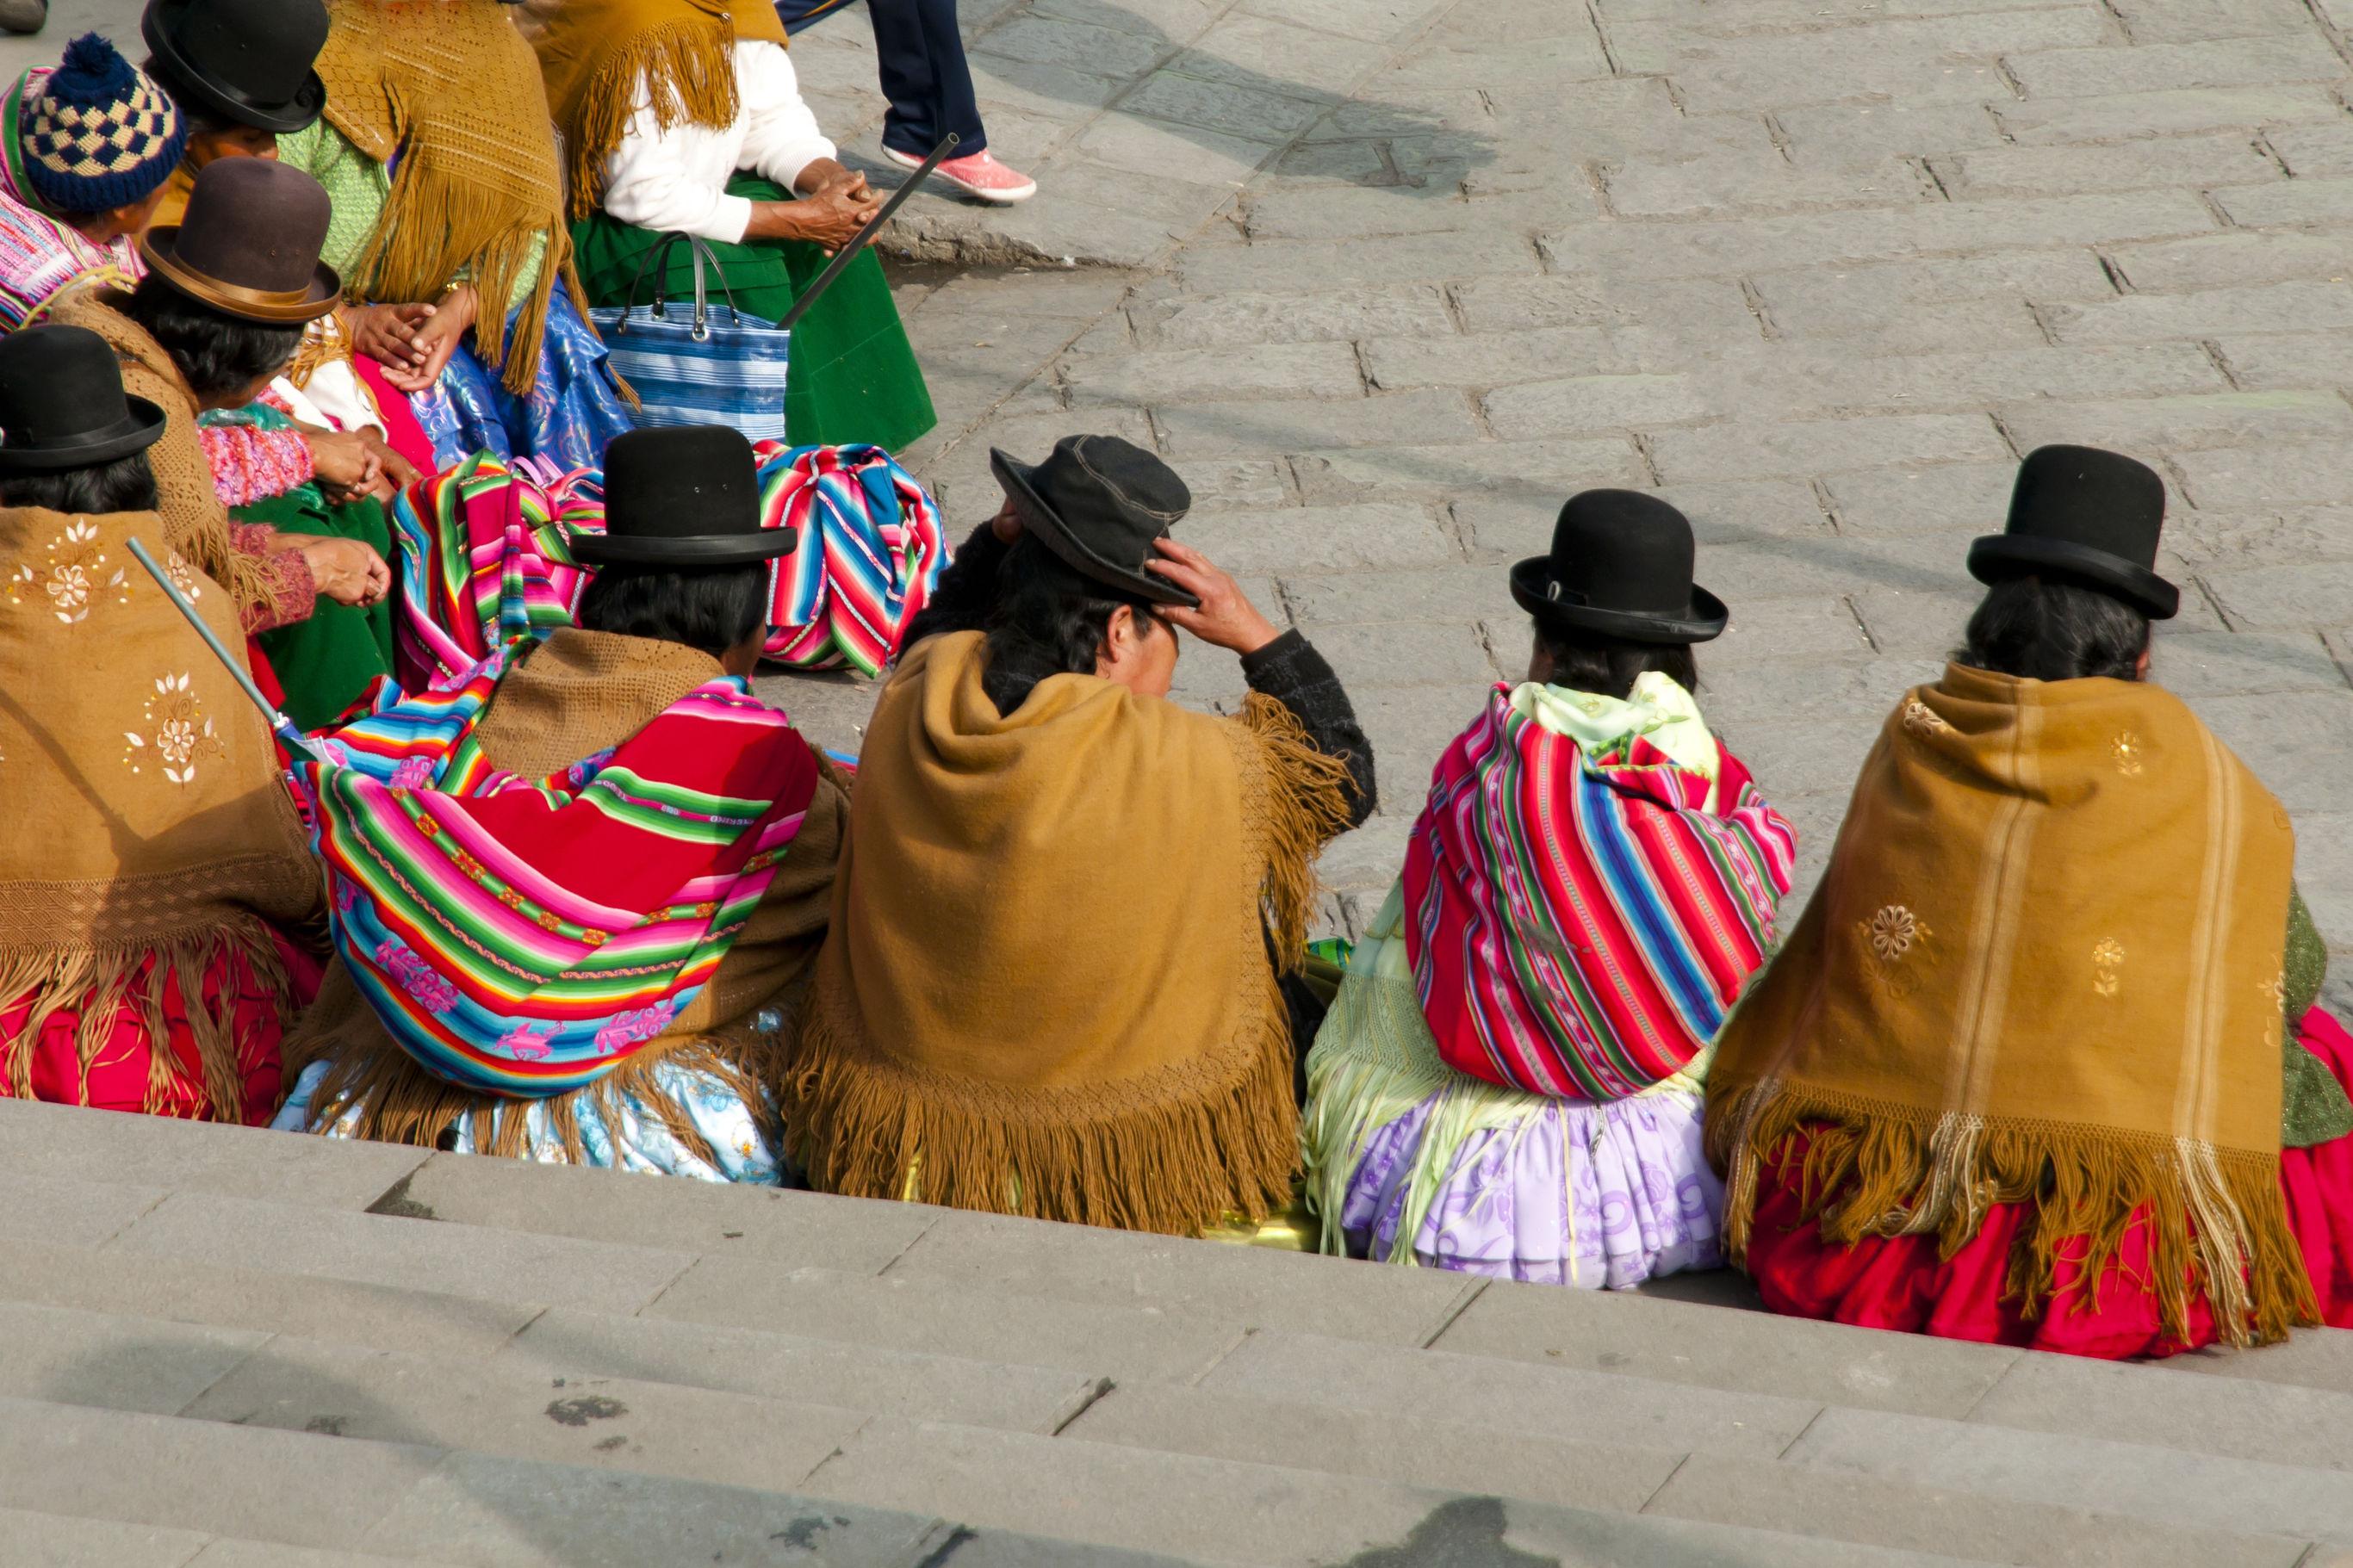 Sfeerimpressie Rondreis Bolivia: Kennismaking met Bolivia